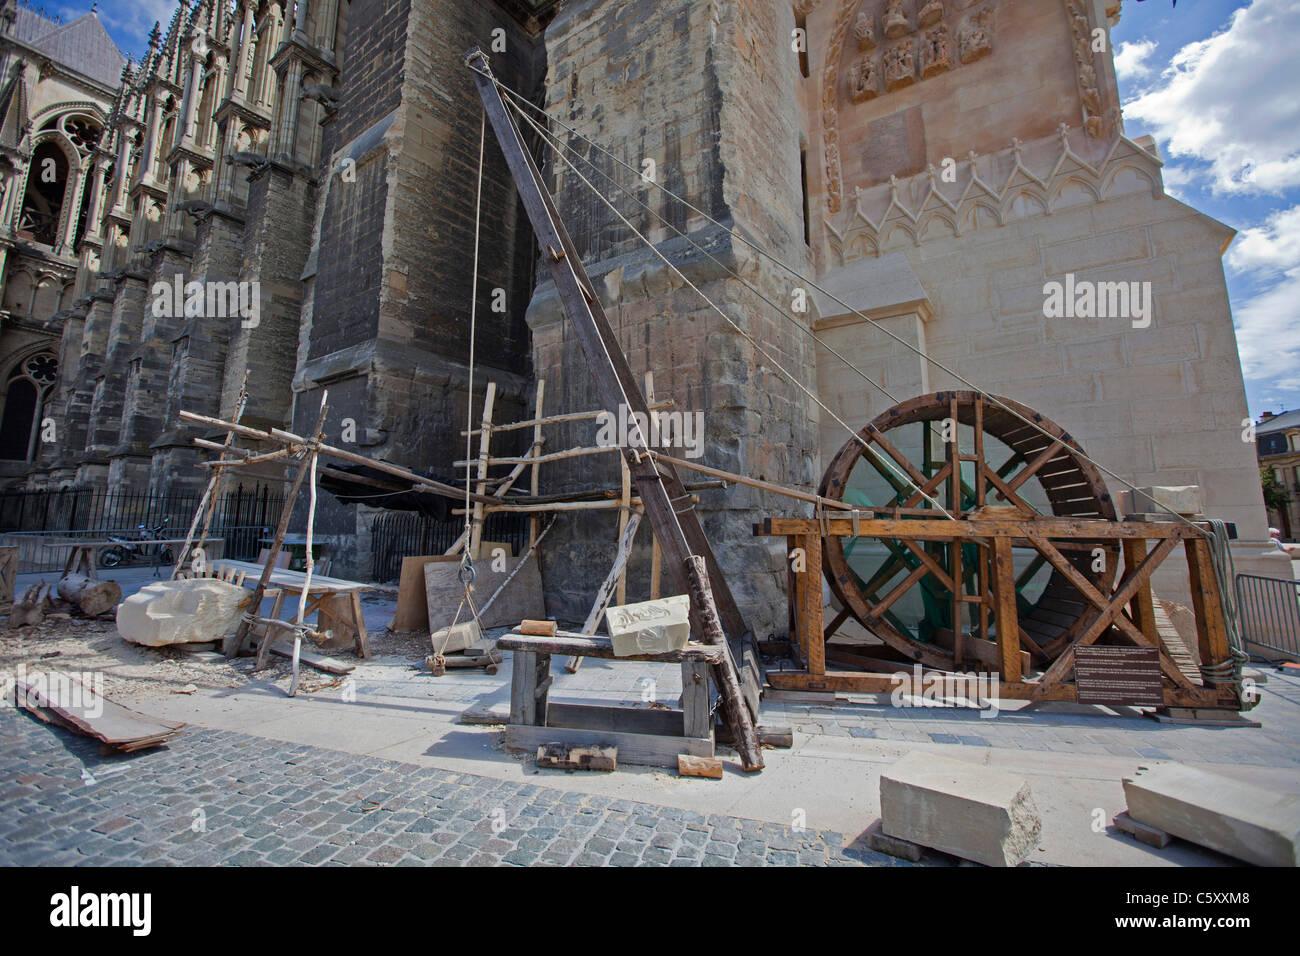 Primitive Treadwheel crane used for building construction in